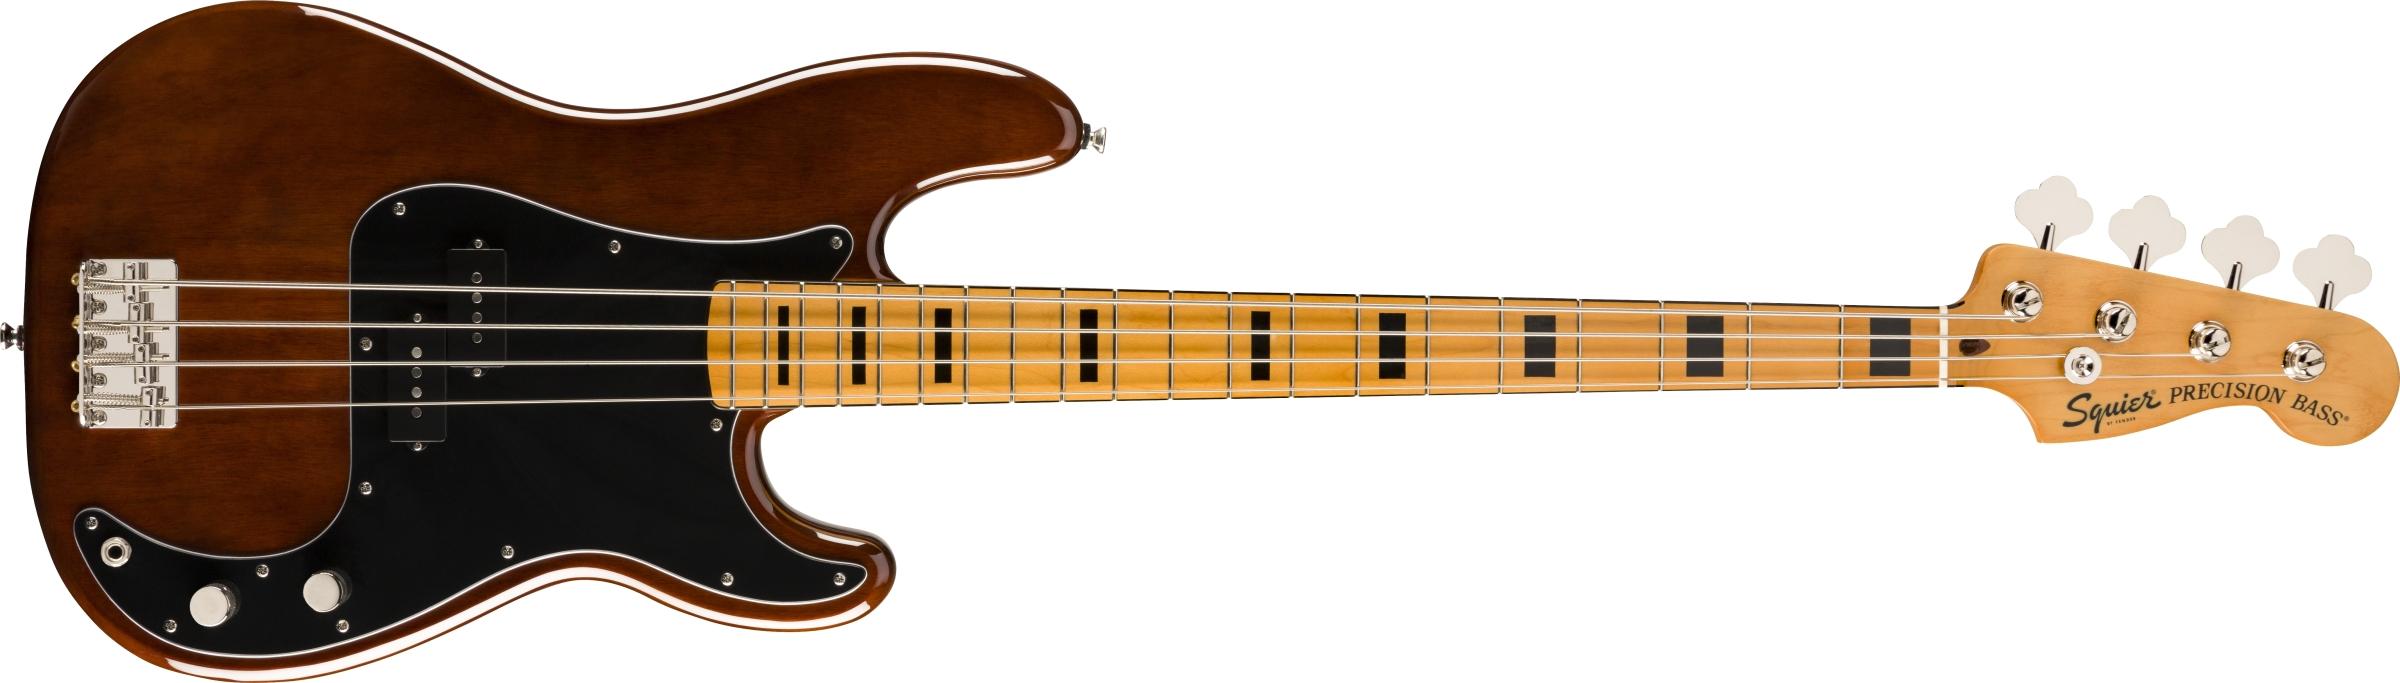 SQUIER-Classic-Vibe-70s-Precision-Bass-MN-Walnut-0374520592-sku-23822